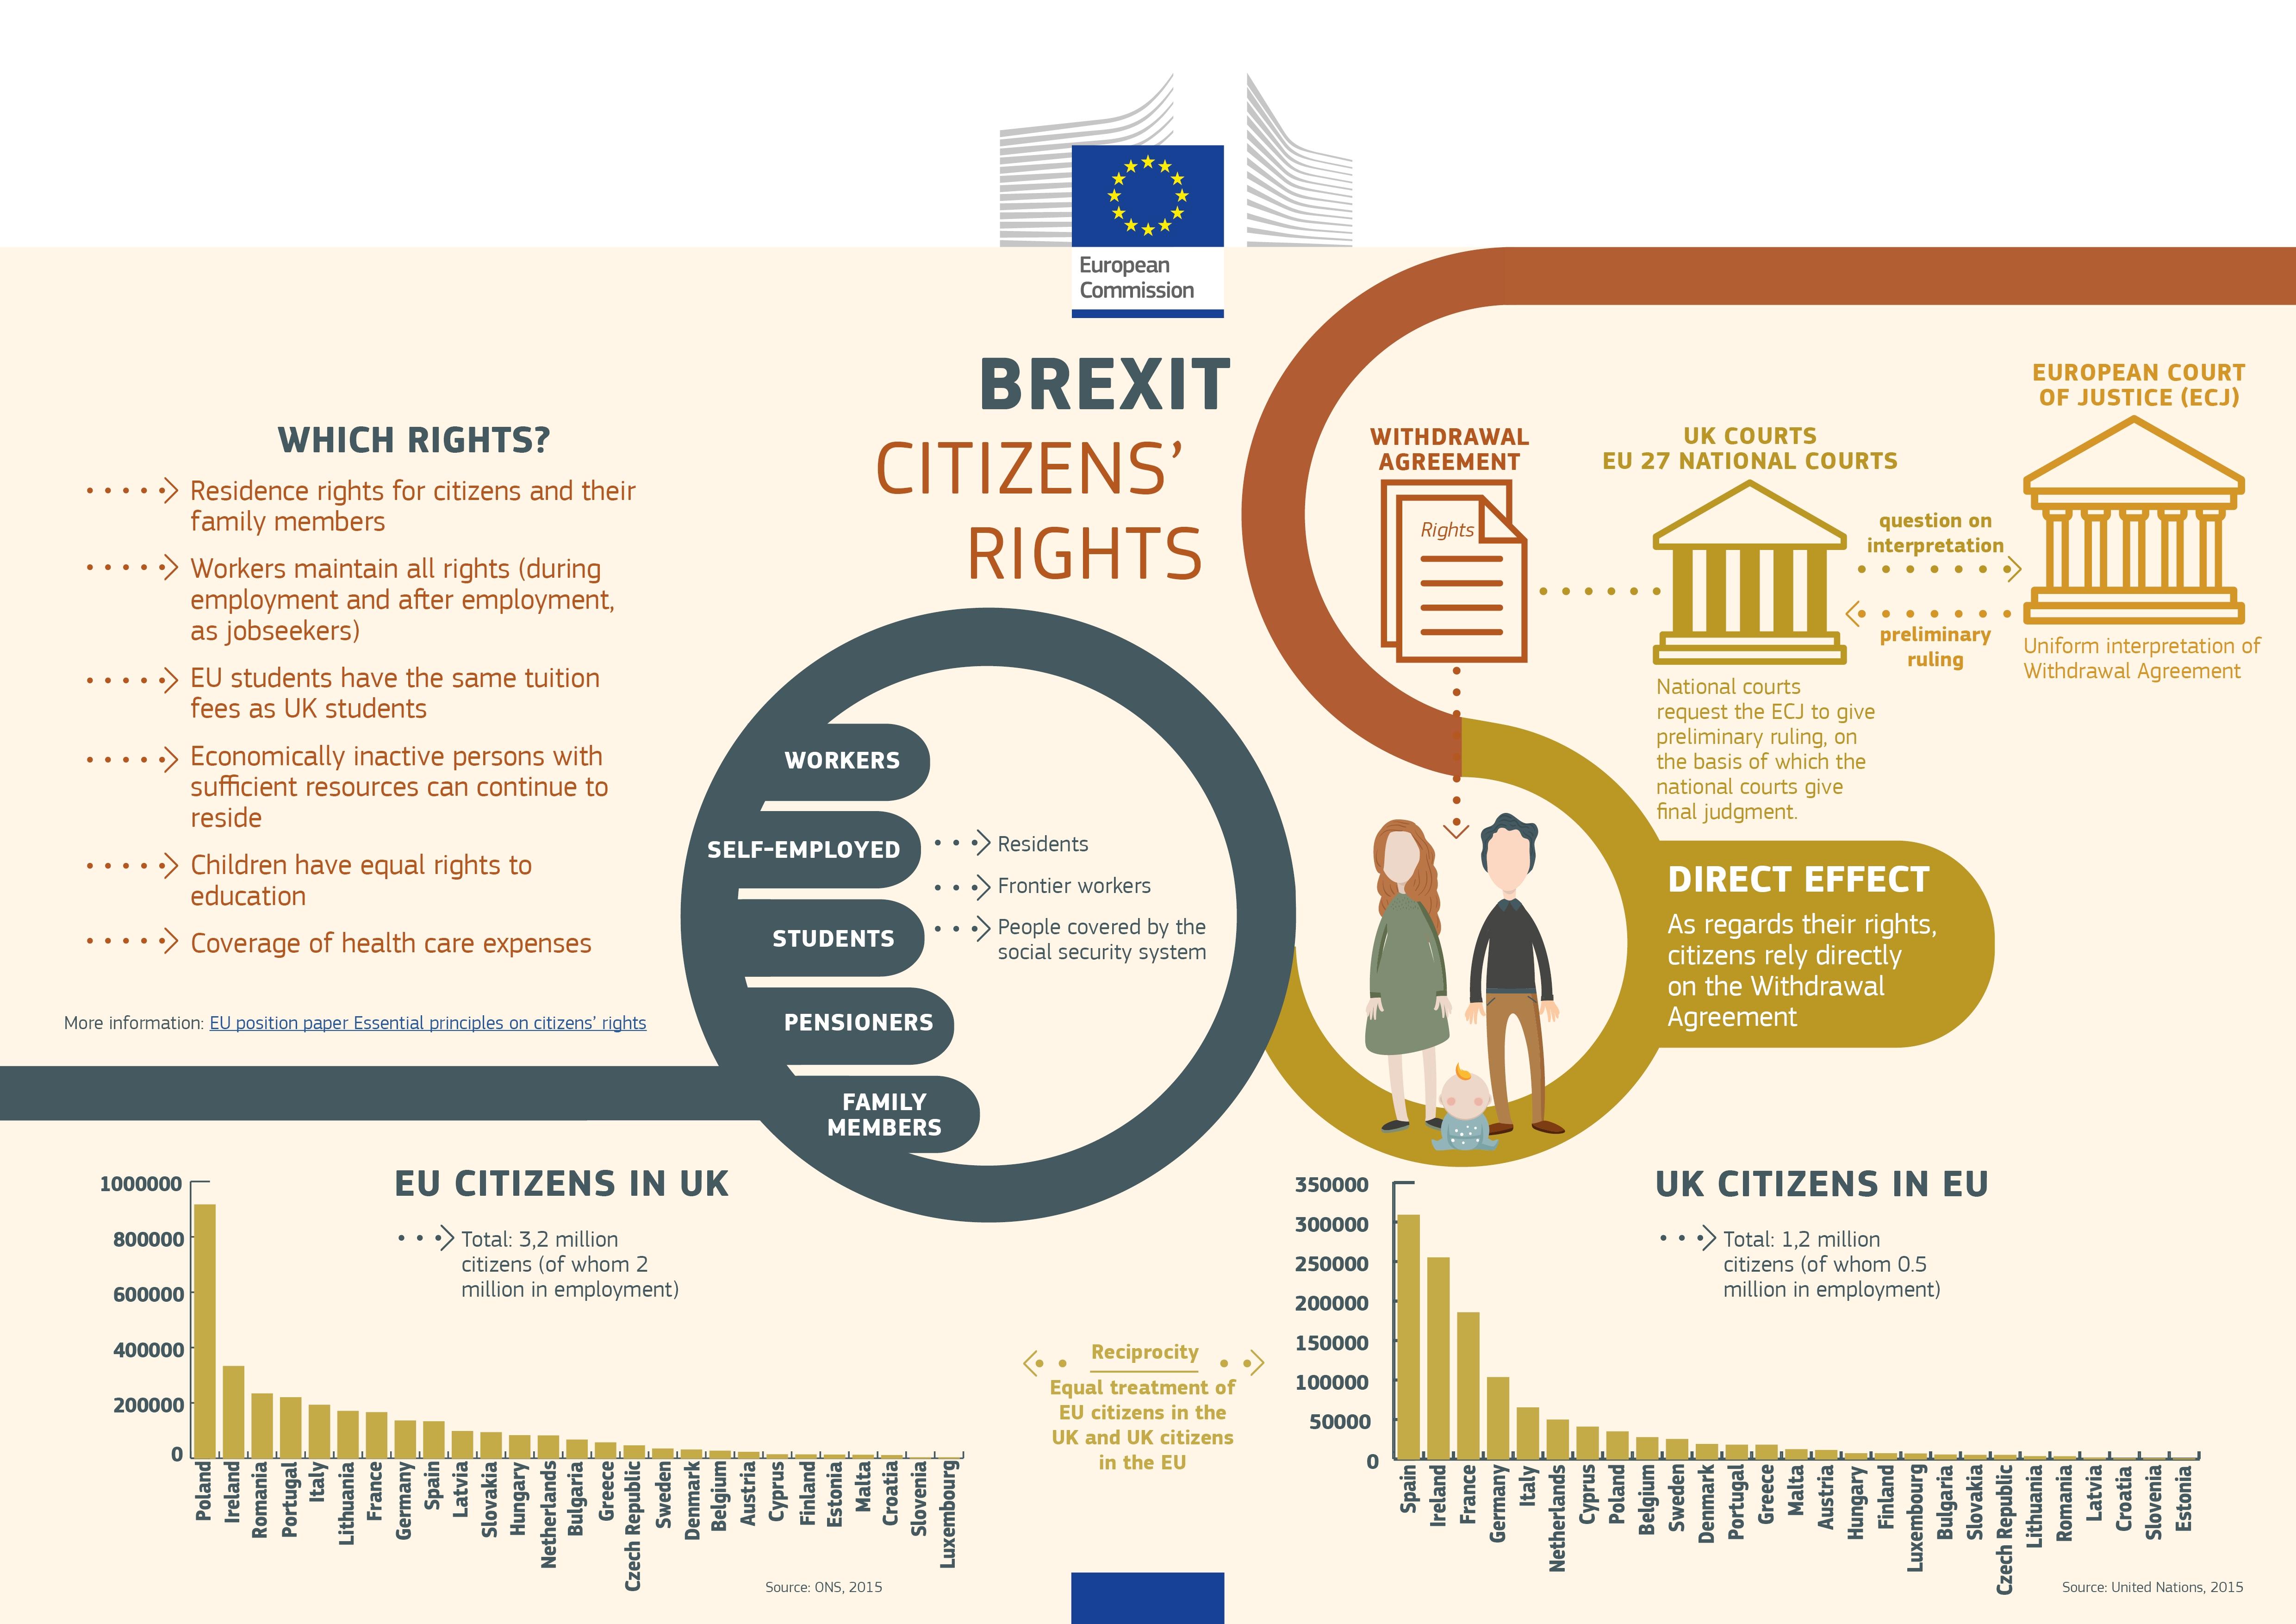 European Commission - PRESS RELEASES - Press release